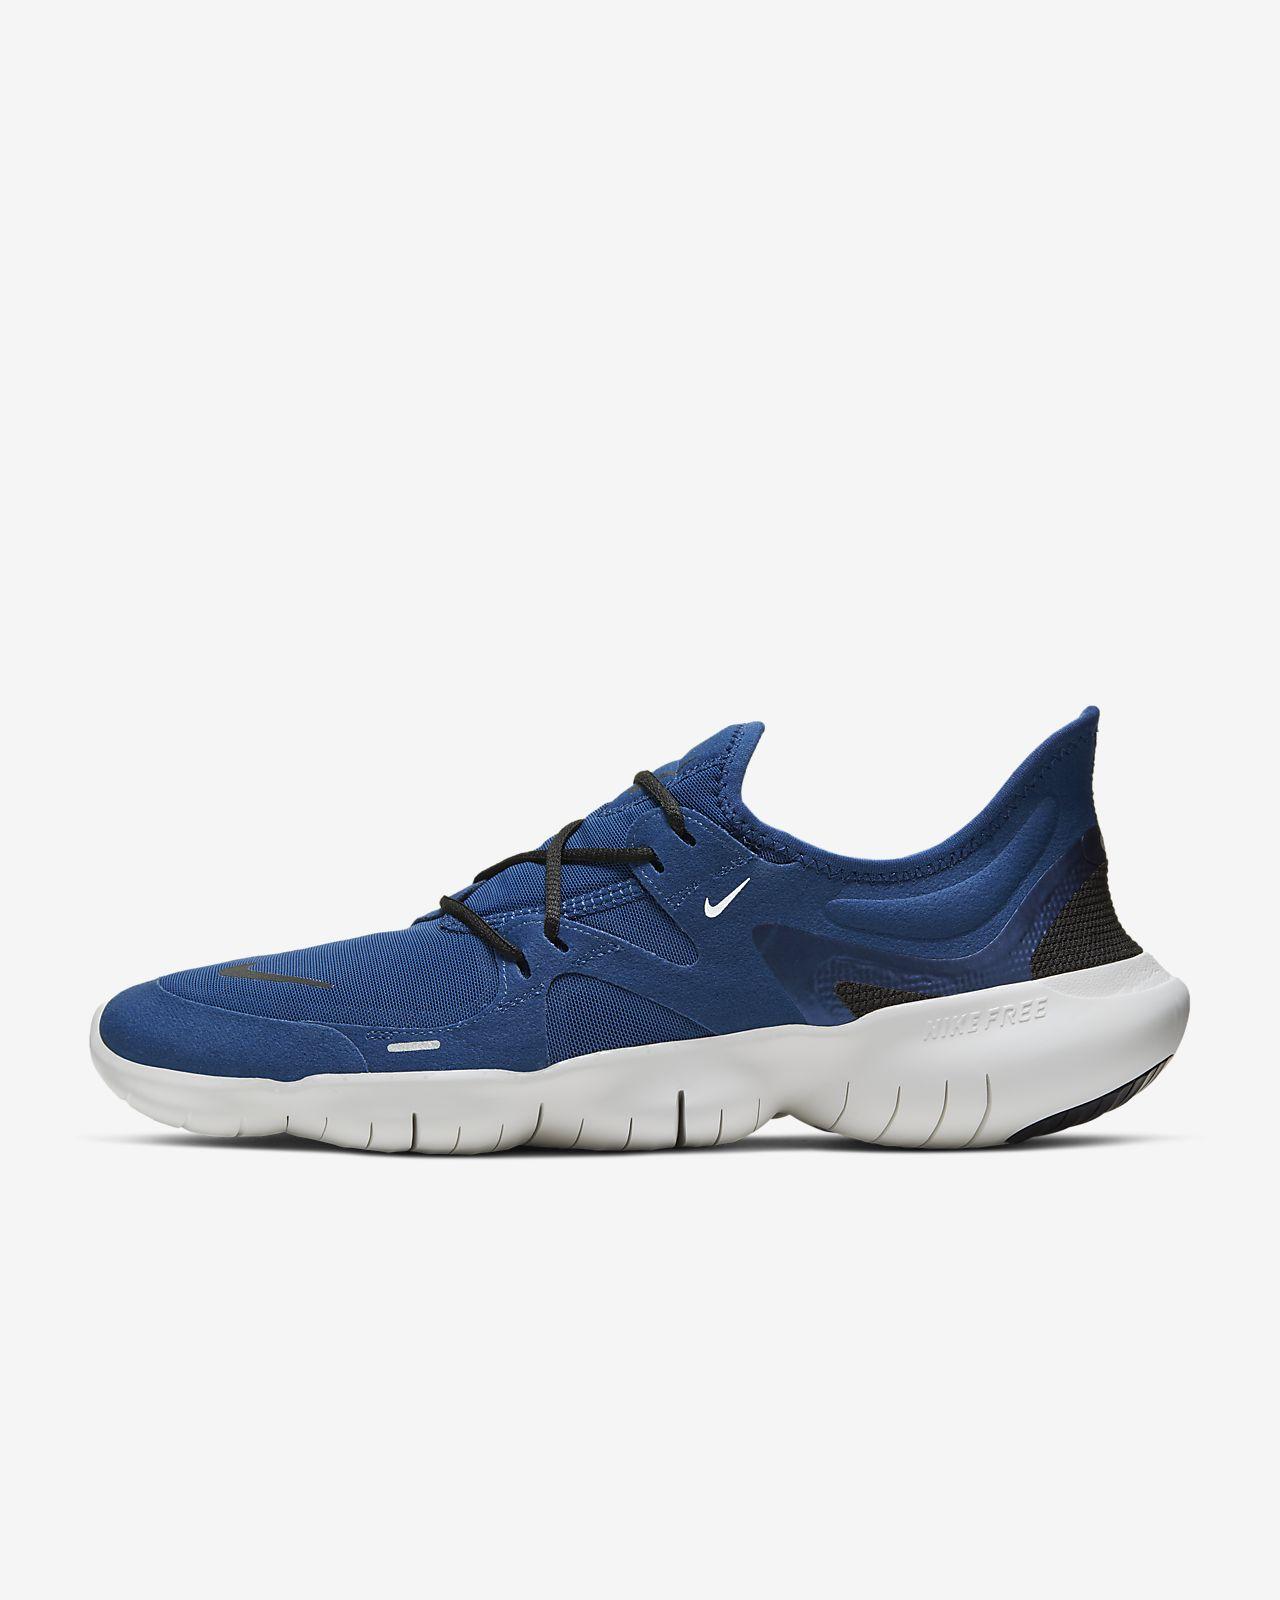 Nike Schuhe Sneaker Laufschuhe free run air 45 Versand frei